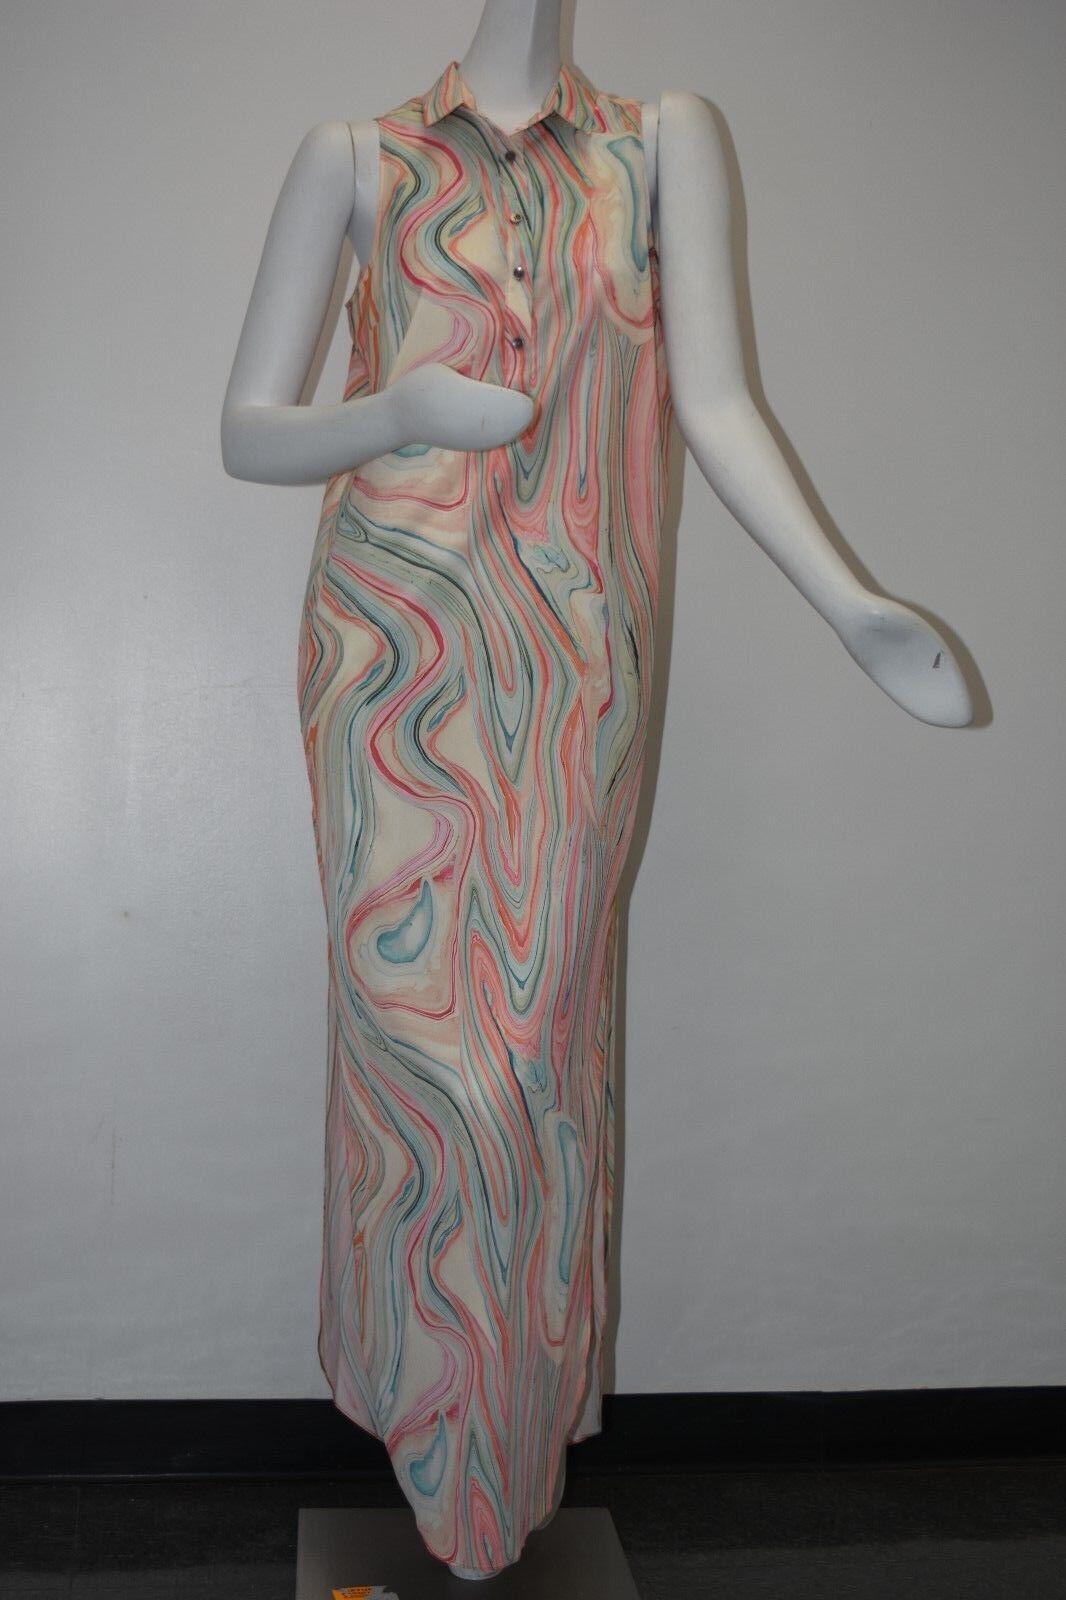 495 NEW w TAG Etienne Aigner Shirt Shirt Shirt Button Down Marble Print Maxi Tunic Dress 6 985646